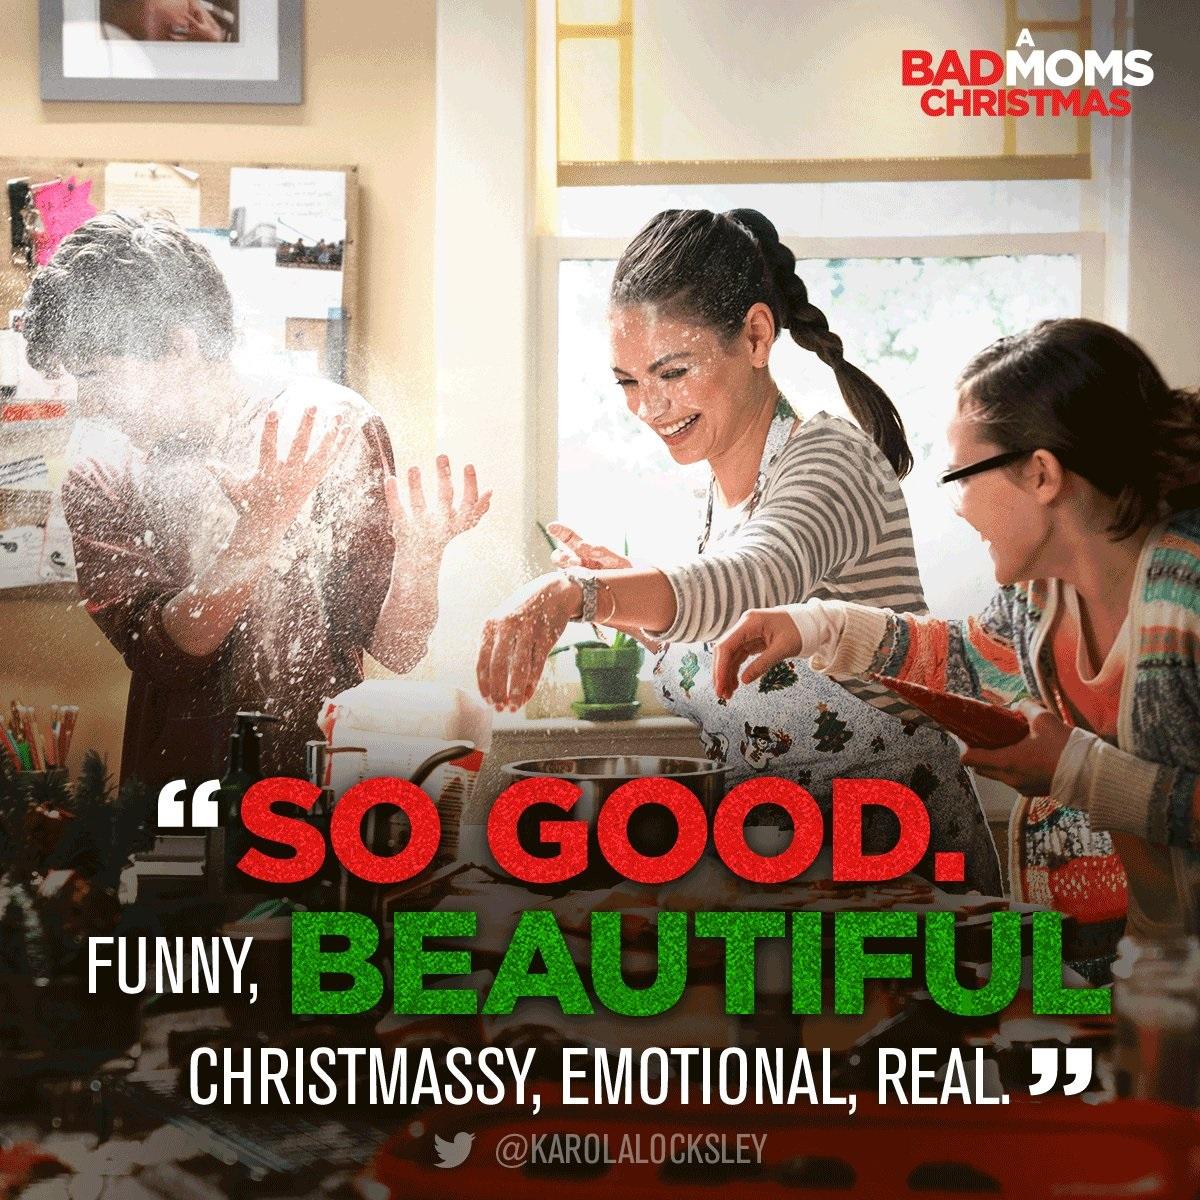 Bad Moms Christmas Poster.A Bad Moms Christmas Surprisingly Heartwarming